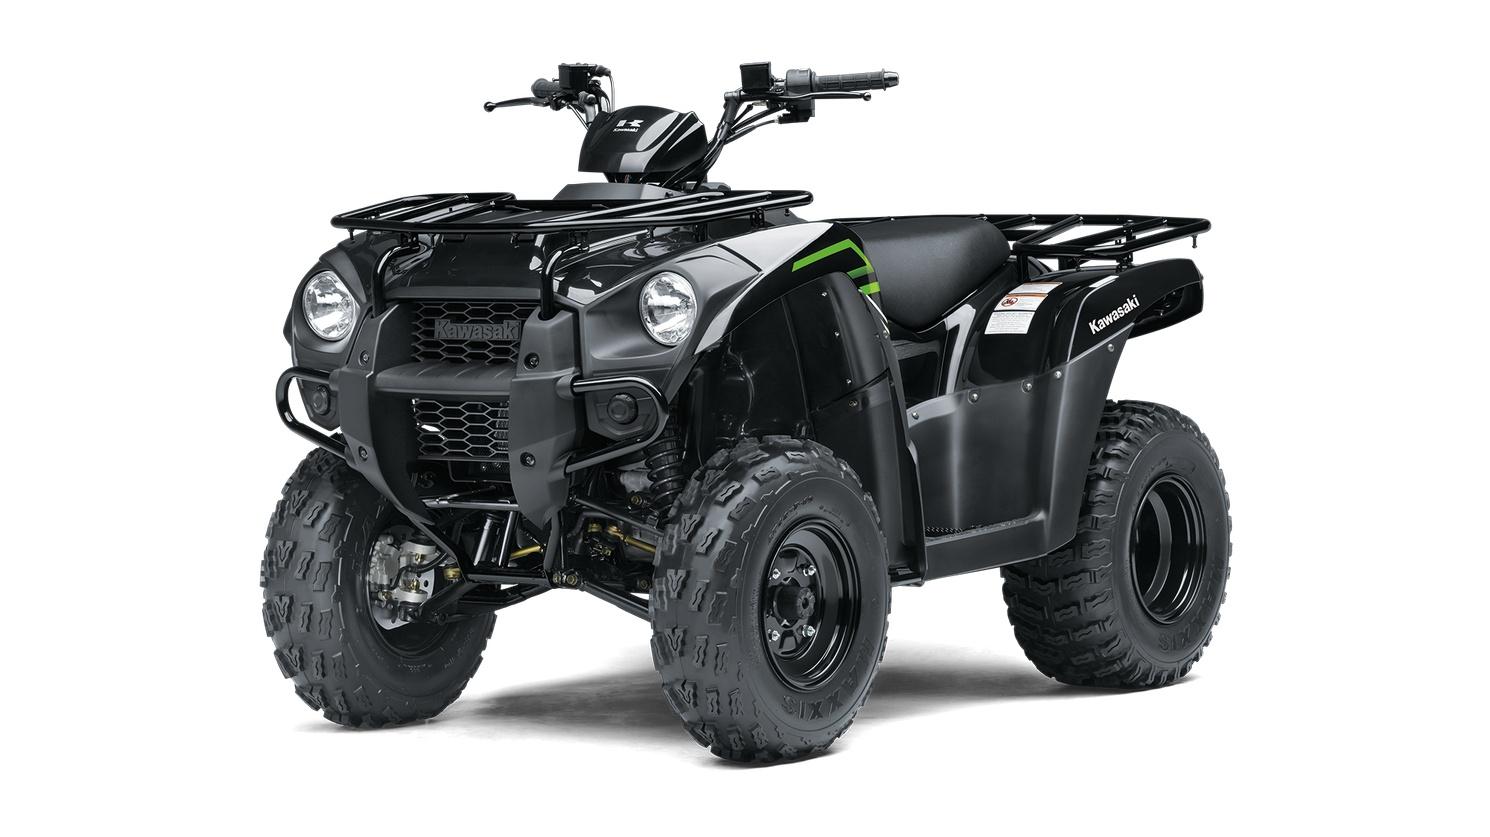 Kawasaki BRUTE FORCE 300 Noir Intense 2020